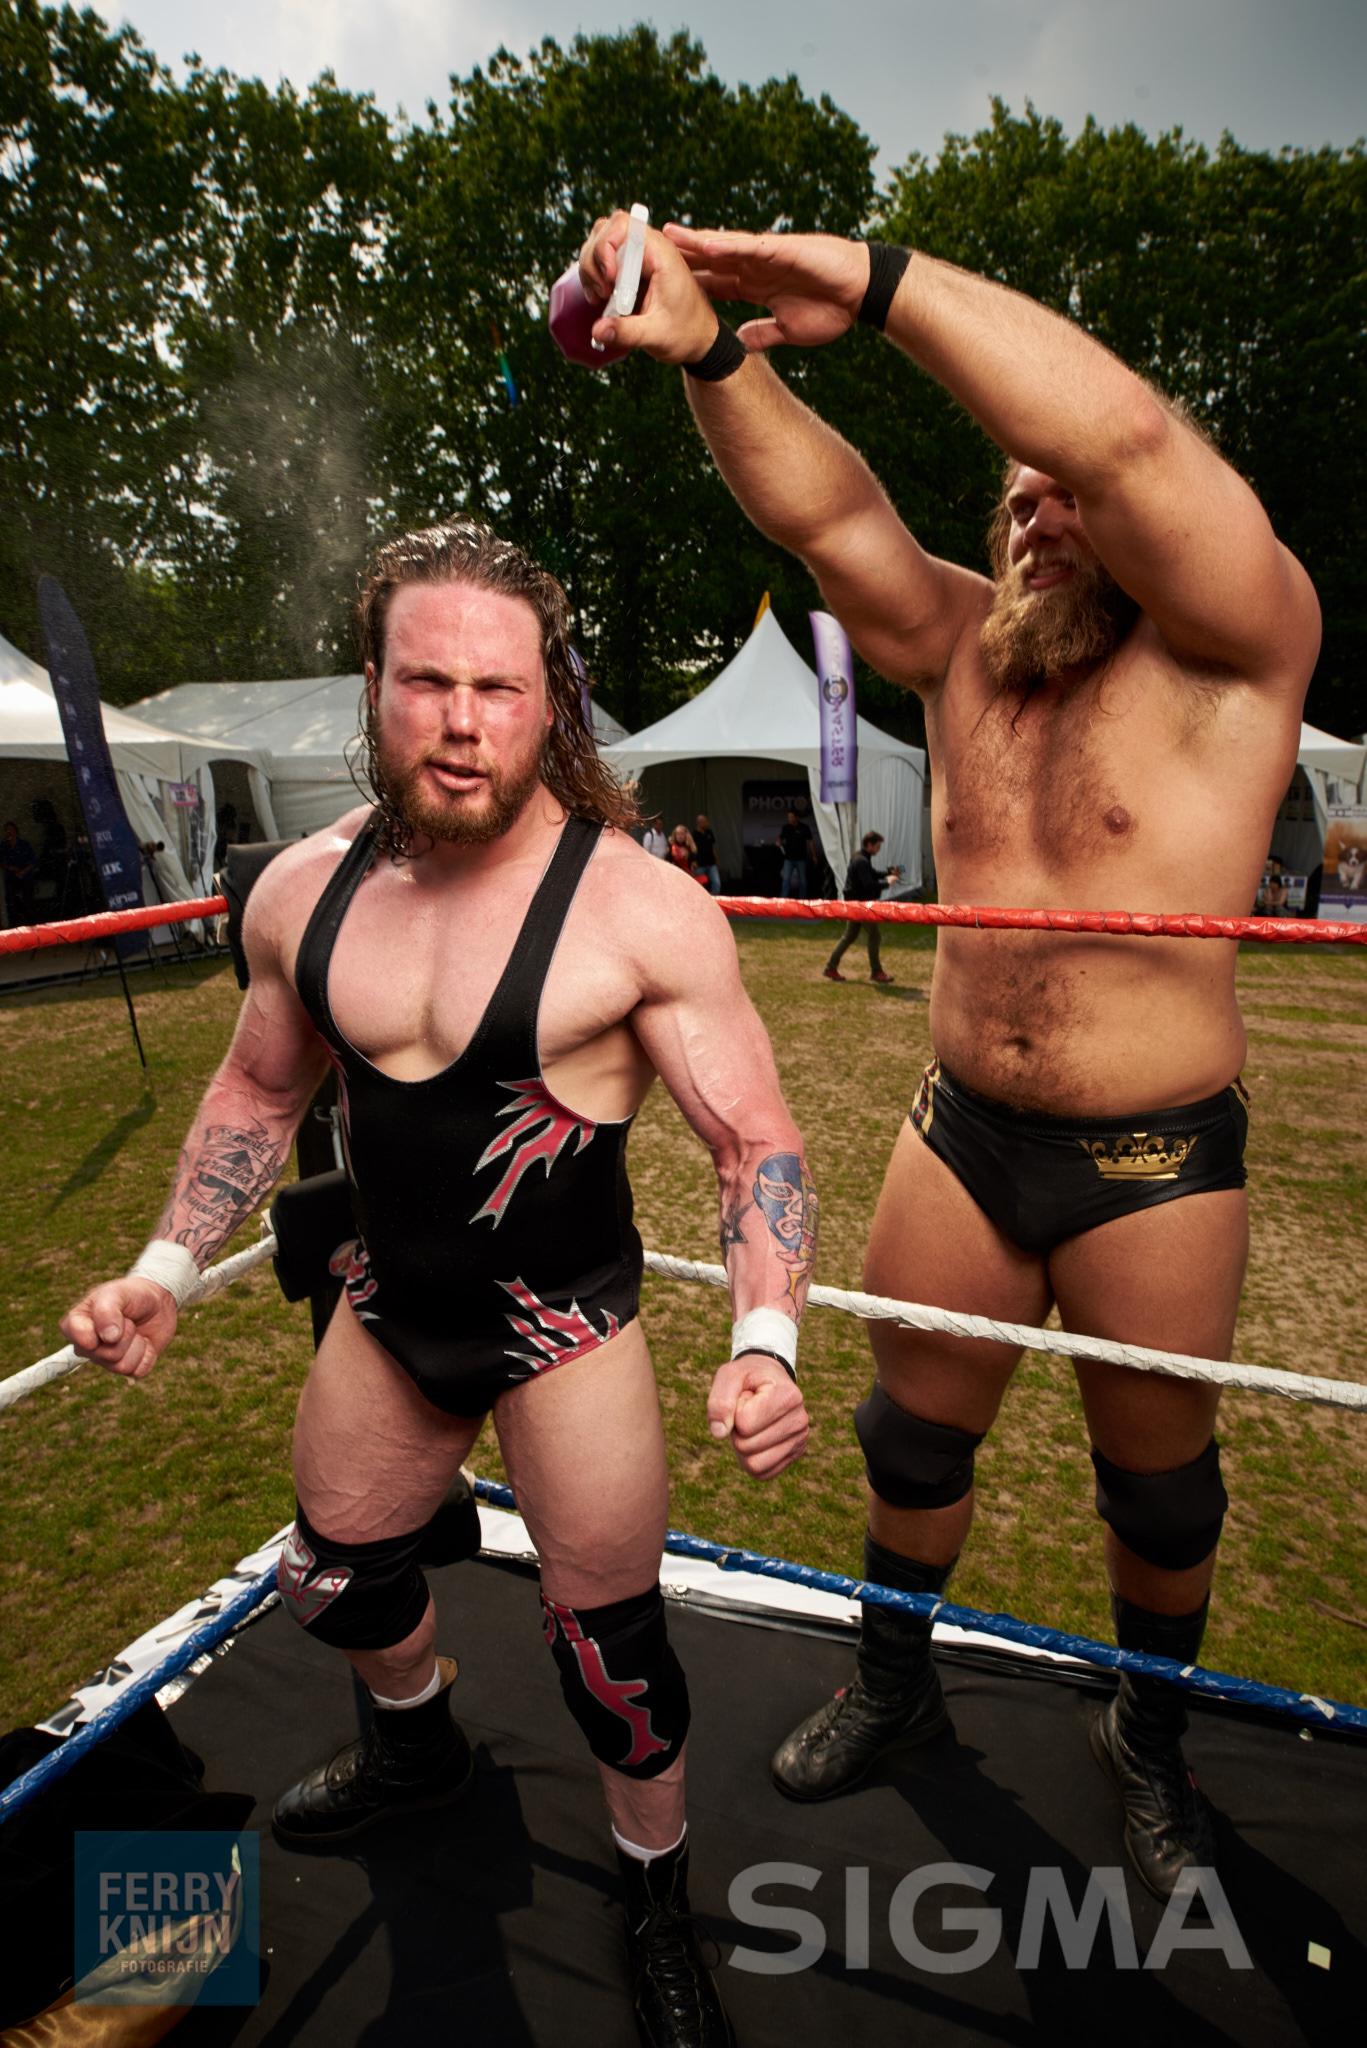 16_05_28_NIKON D750_Sigma FotoFair Wrestling__DSC0842_HighWeb.jpg